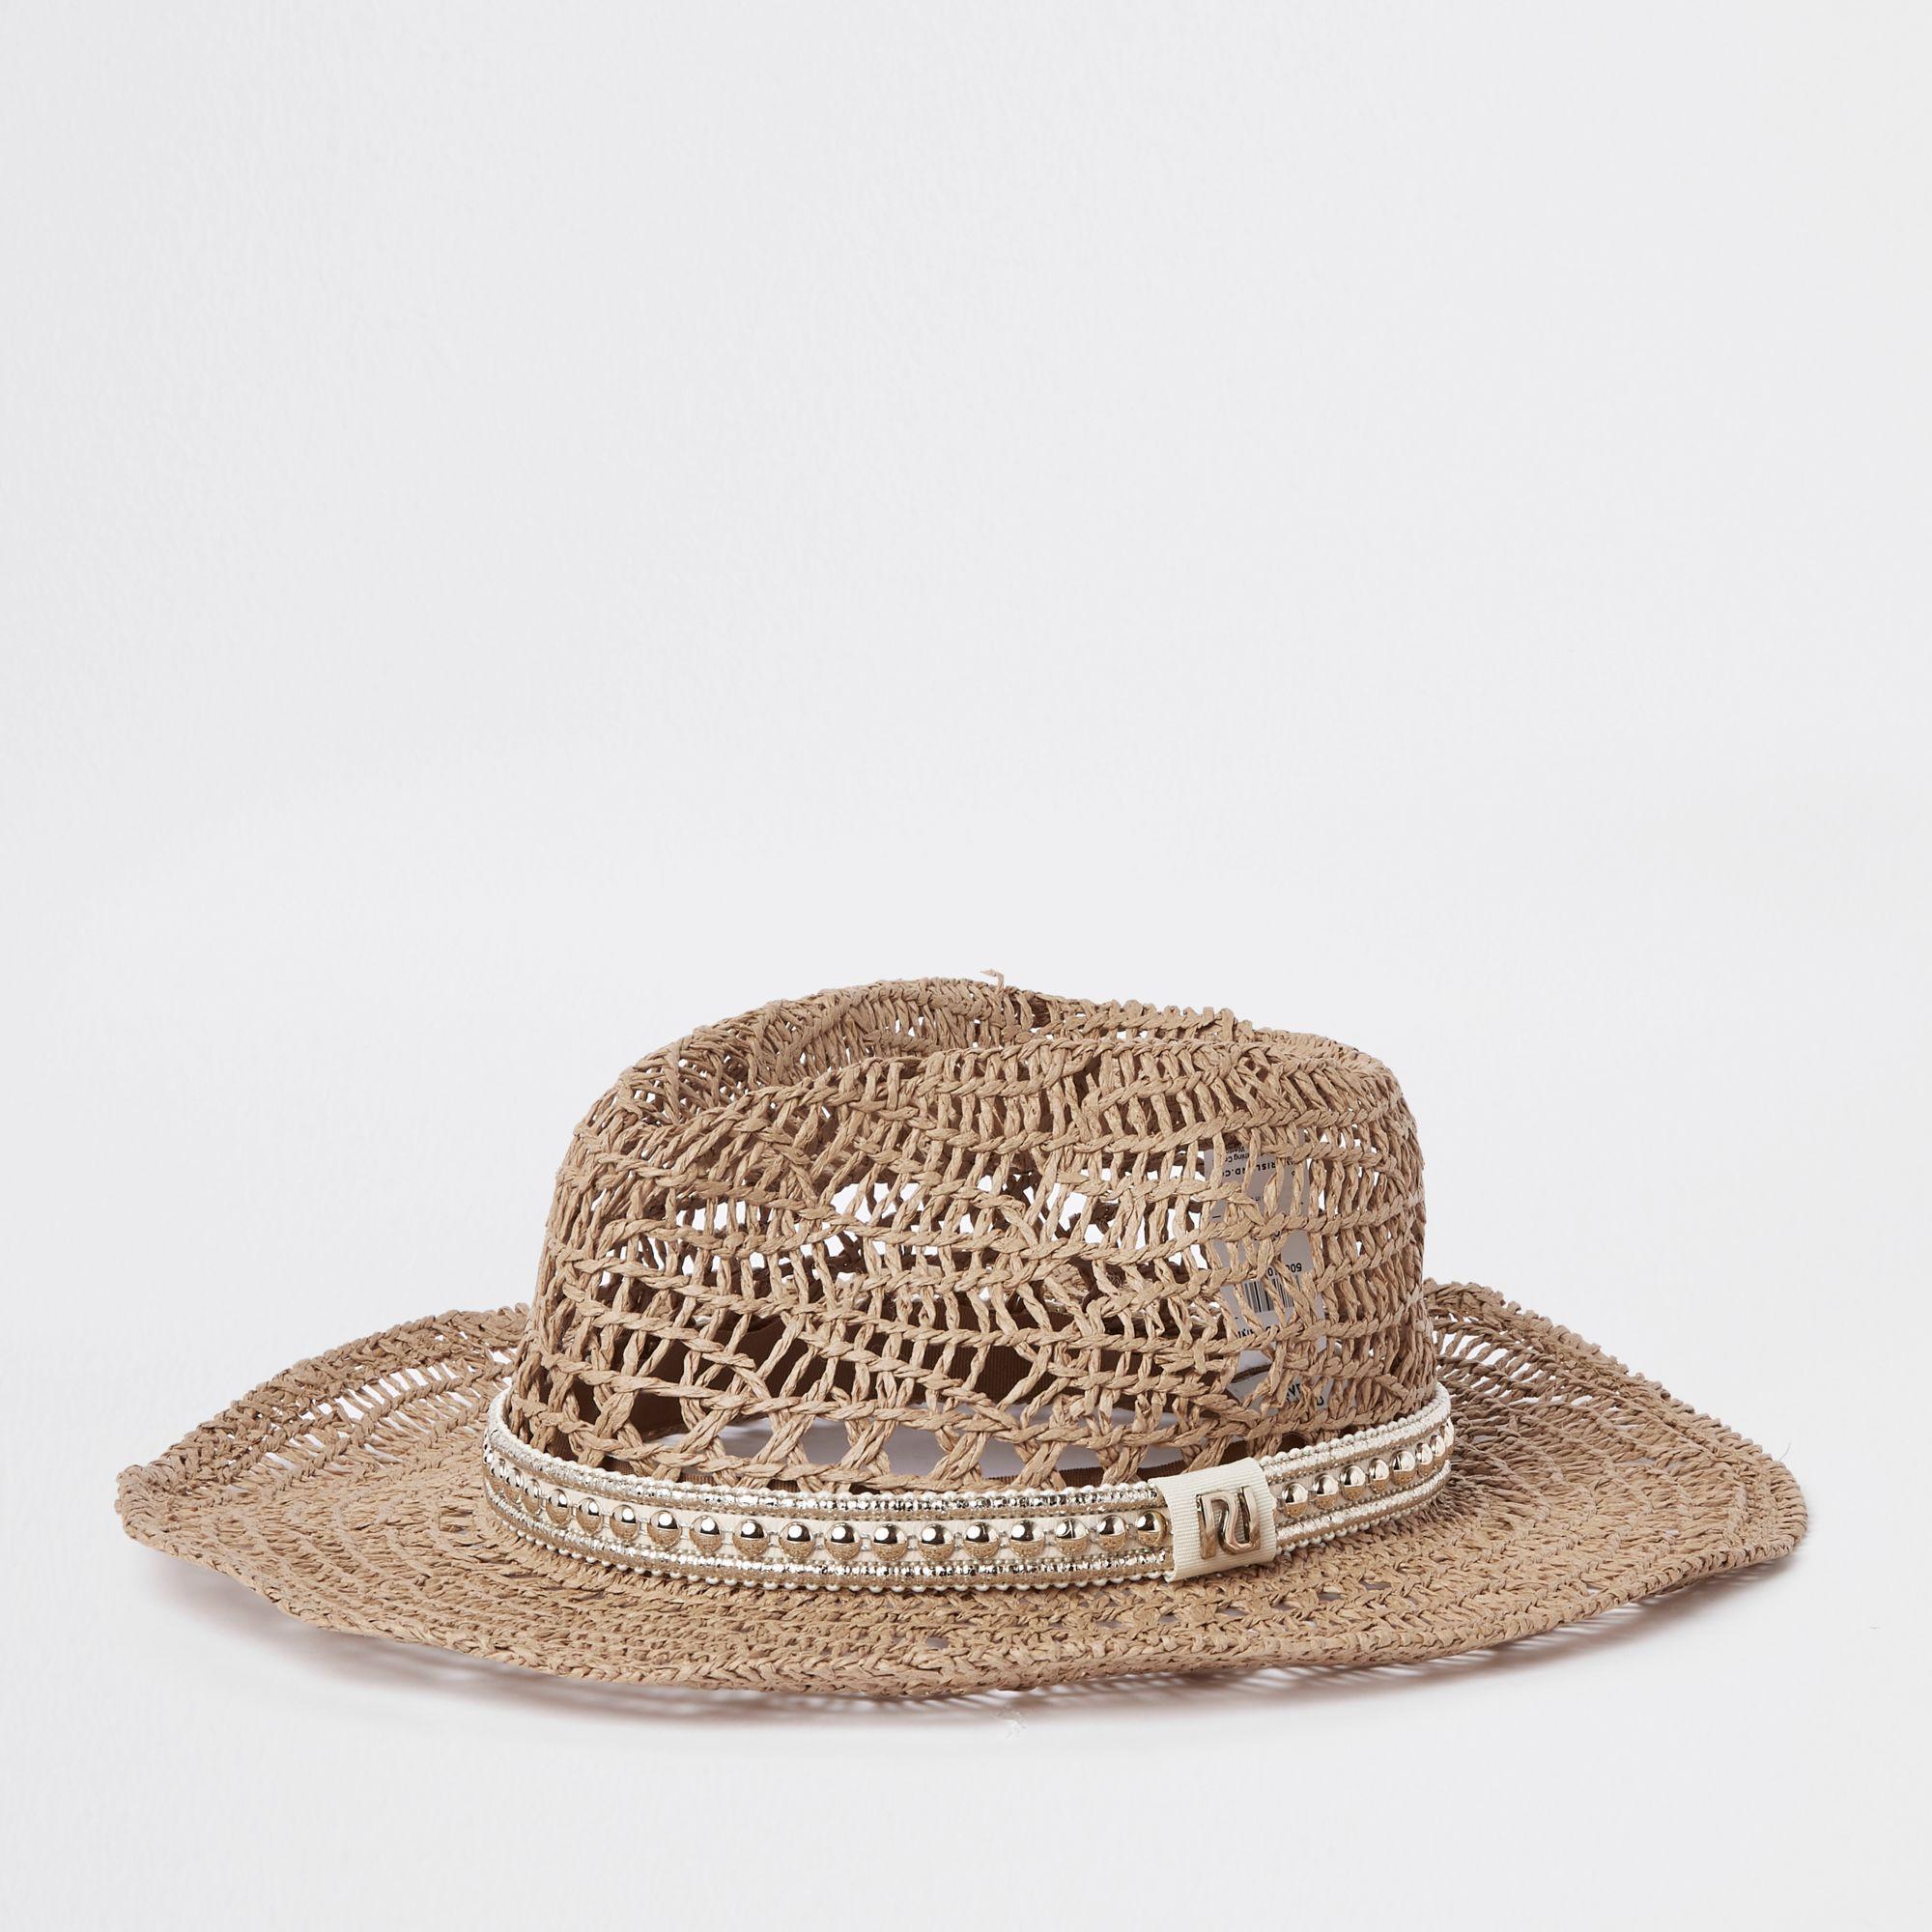 b551256dd River Island Beige Western Style Straw Hat in Natural - Lyst